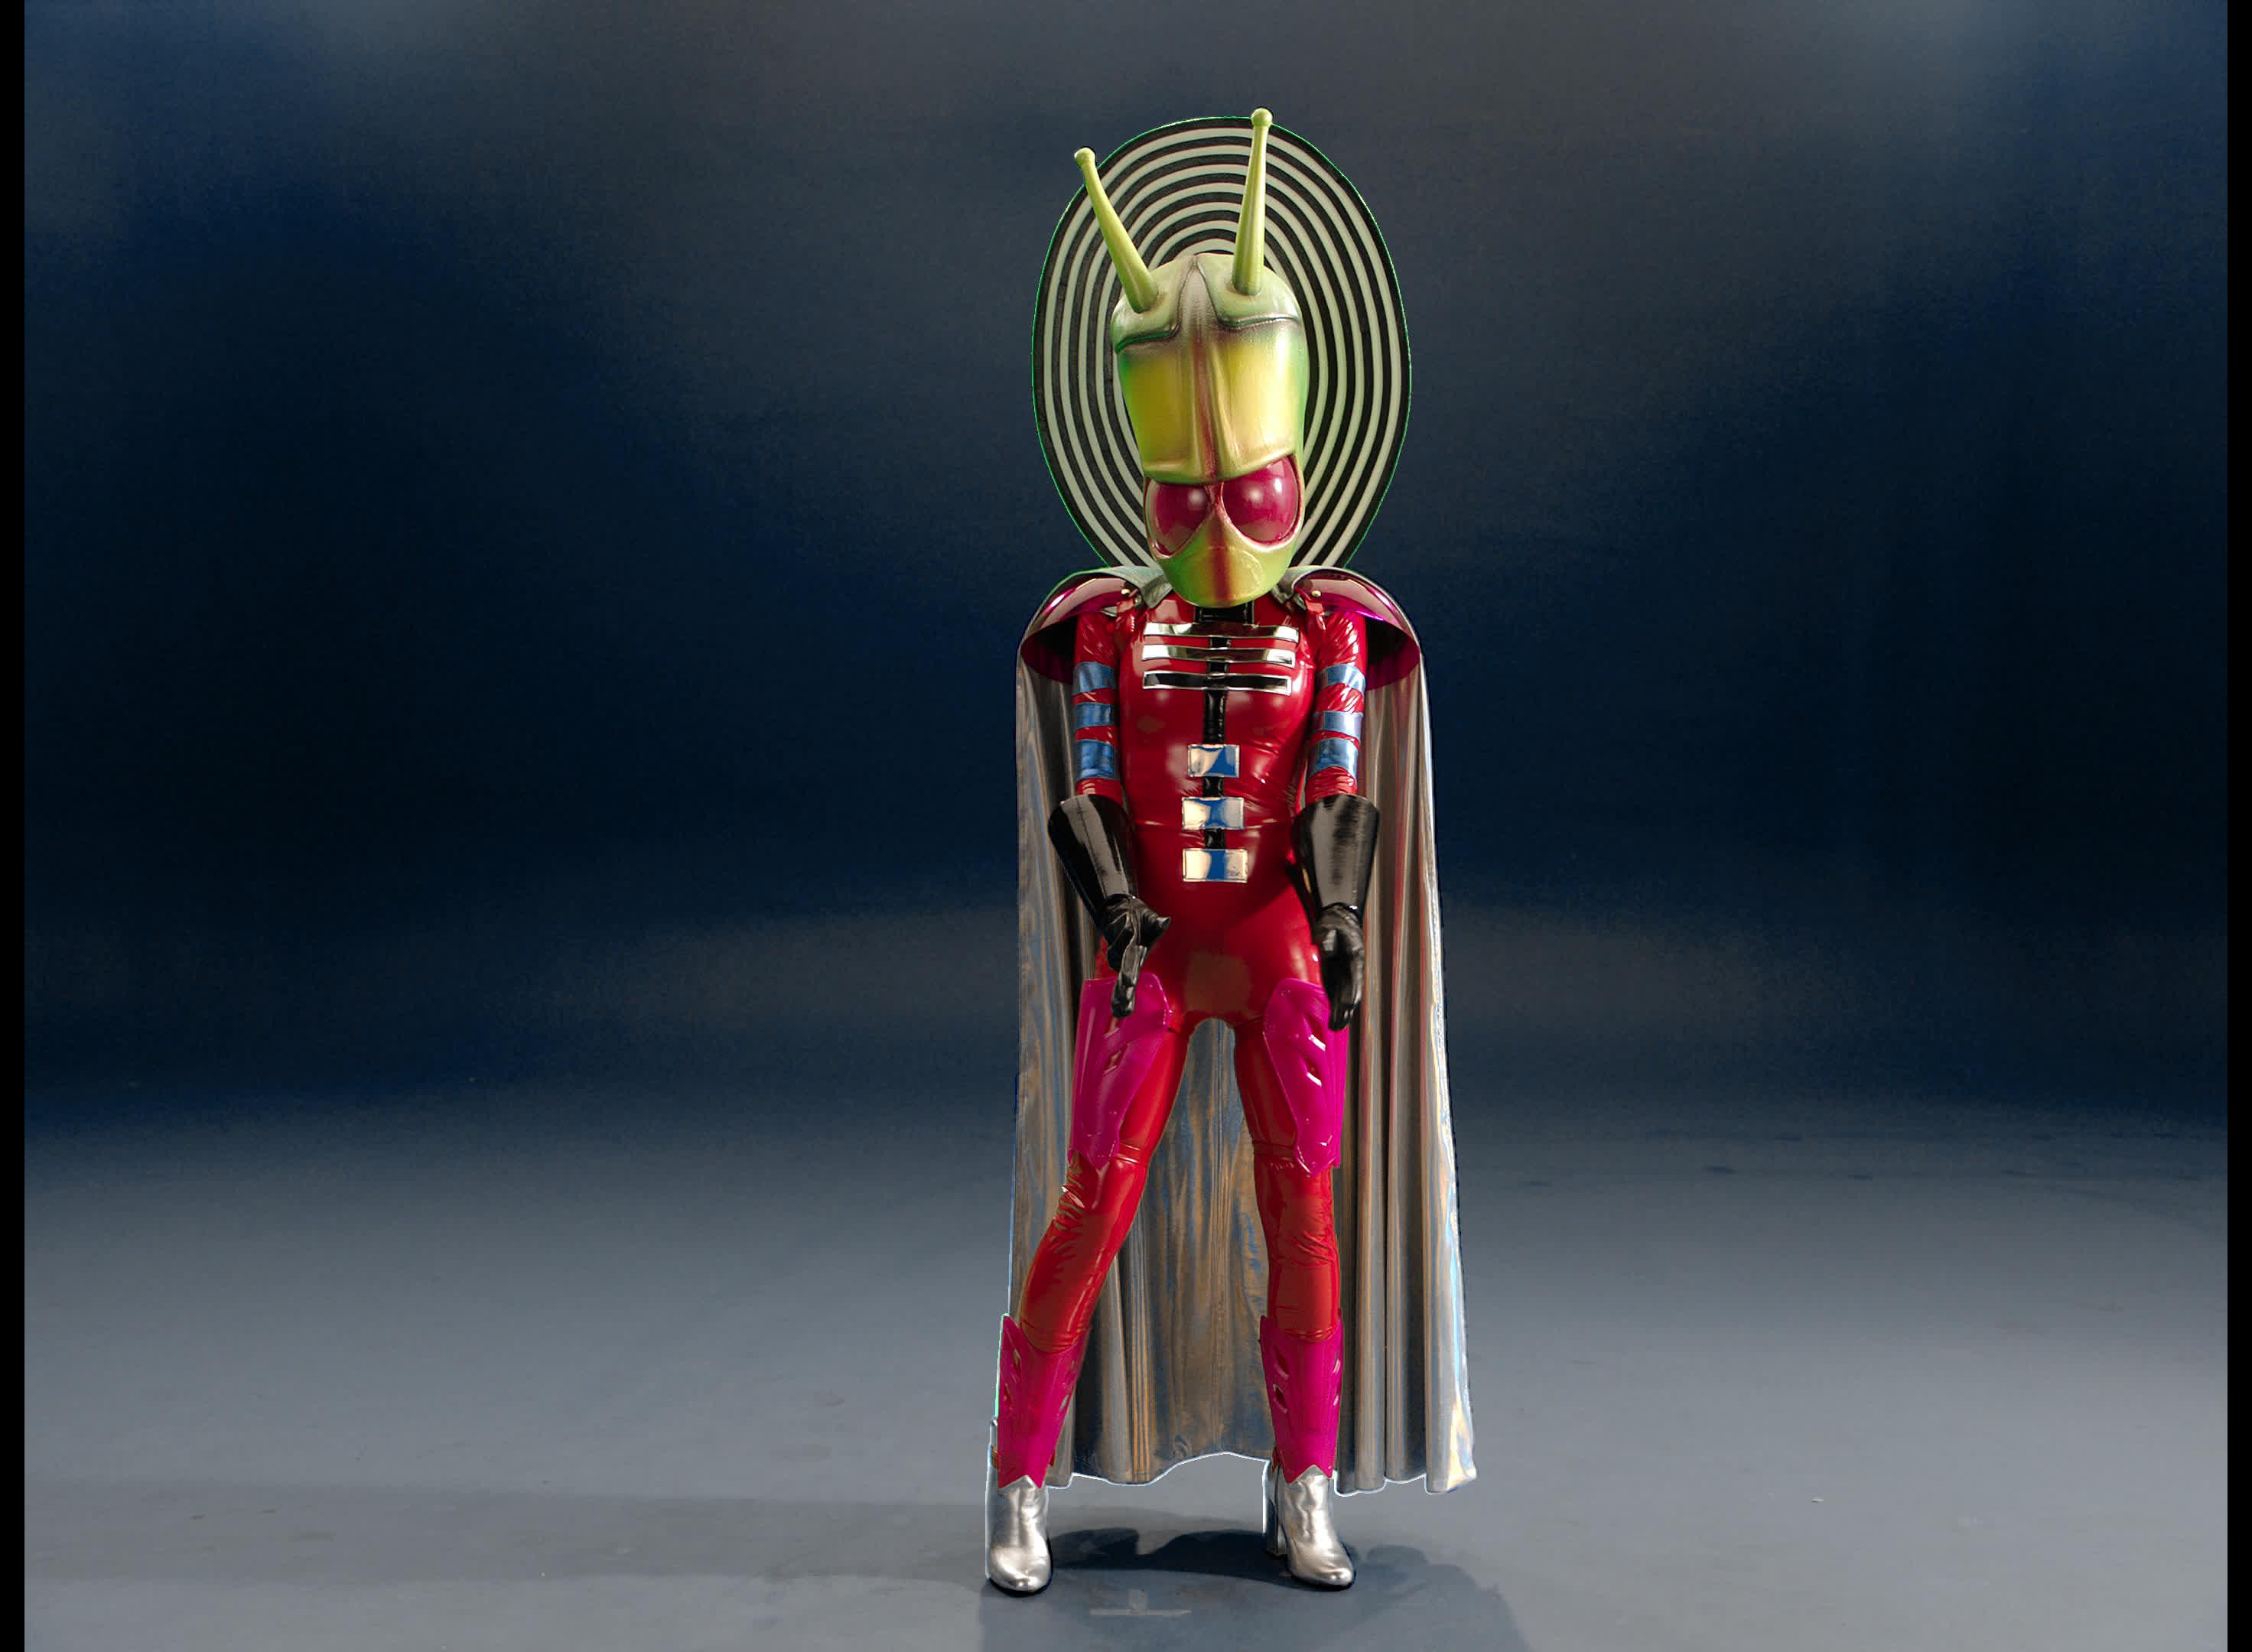 alien, masked singer, pose, posing, the masked singer, the masked singer on fox, Alien Posing GIFs